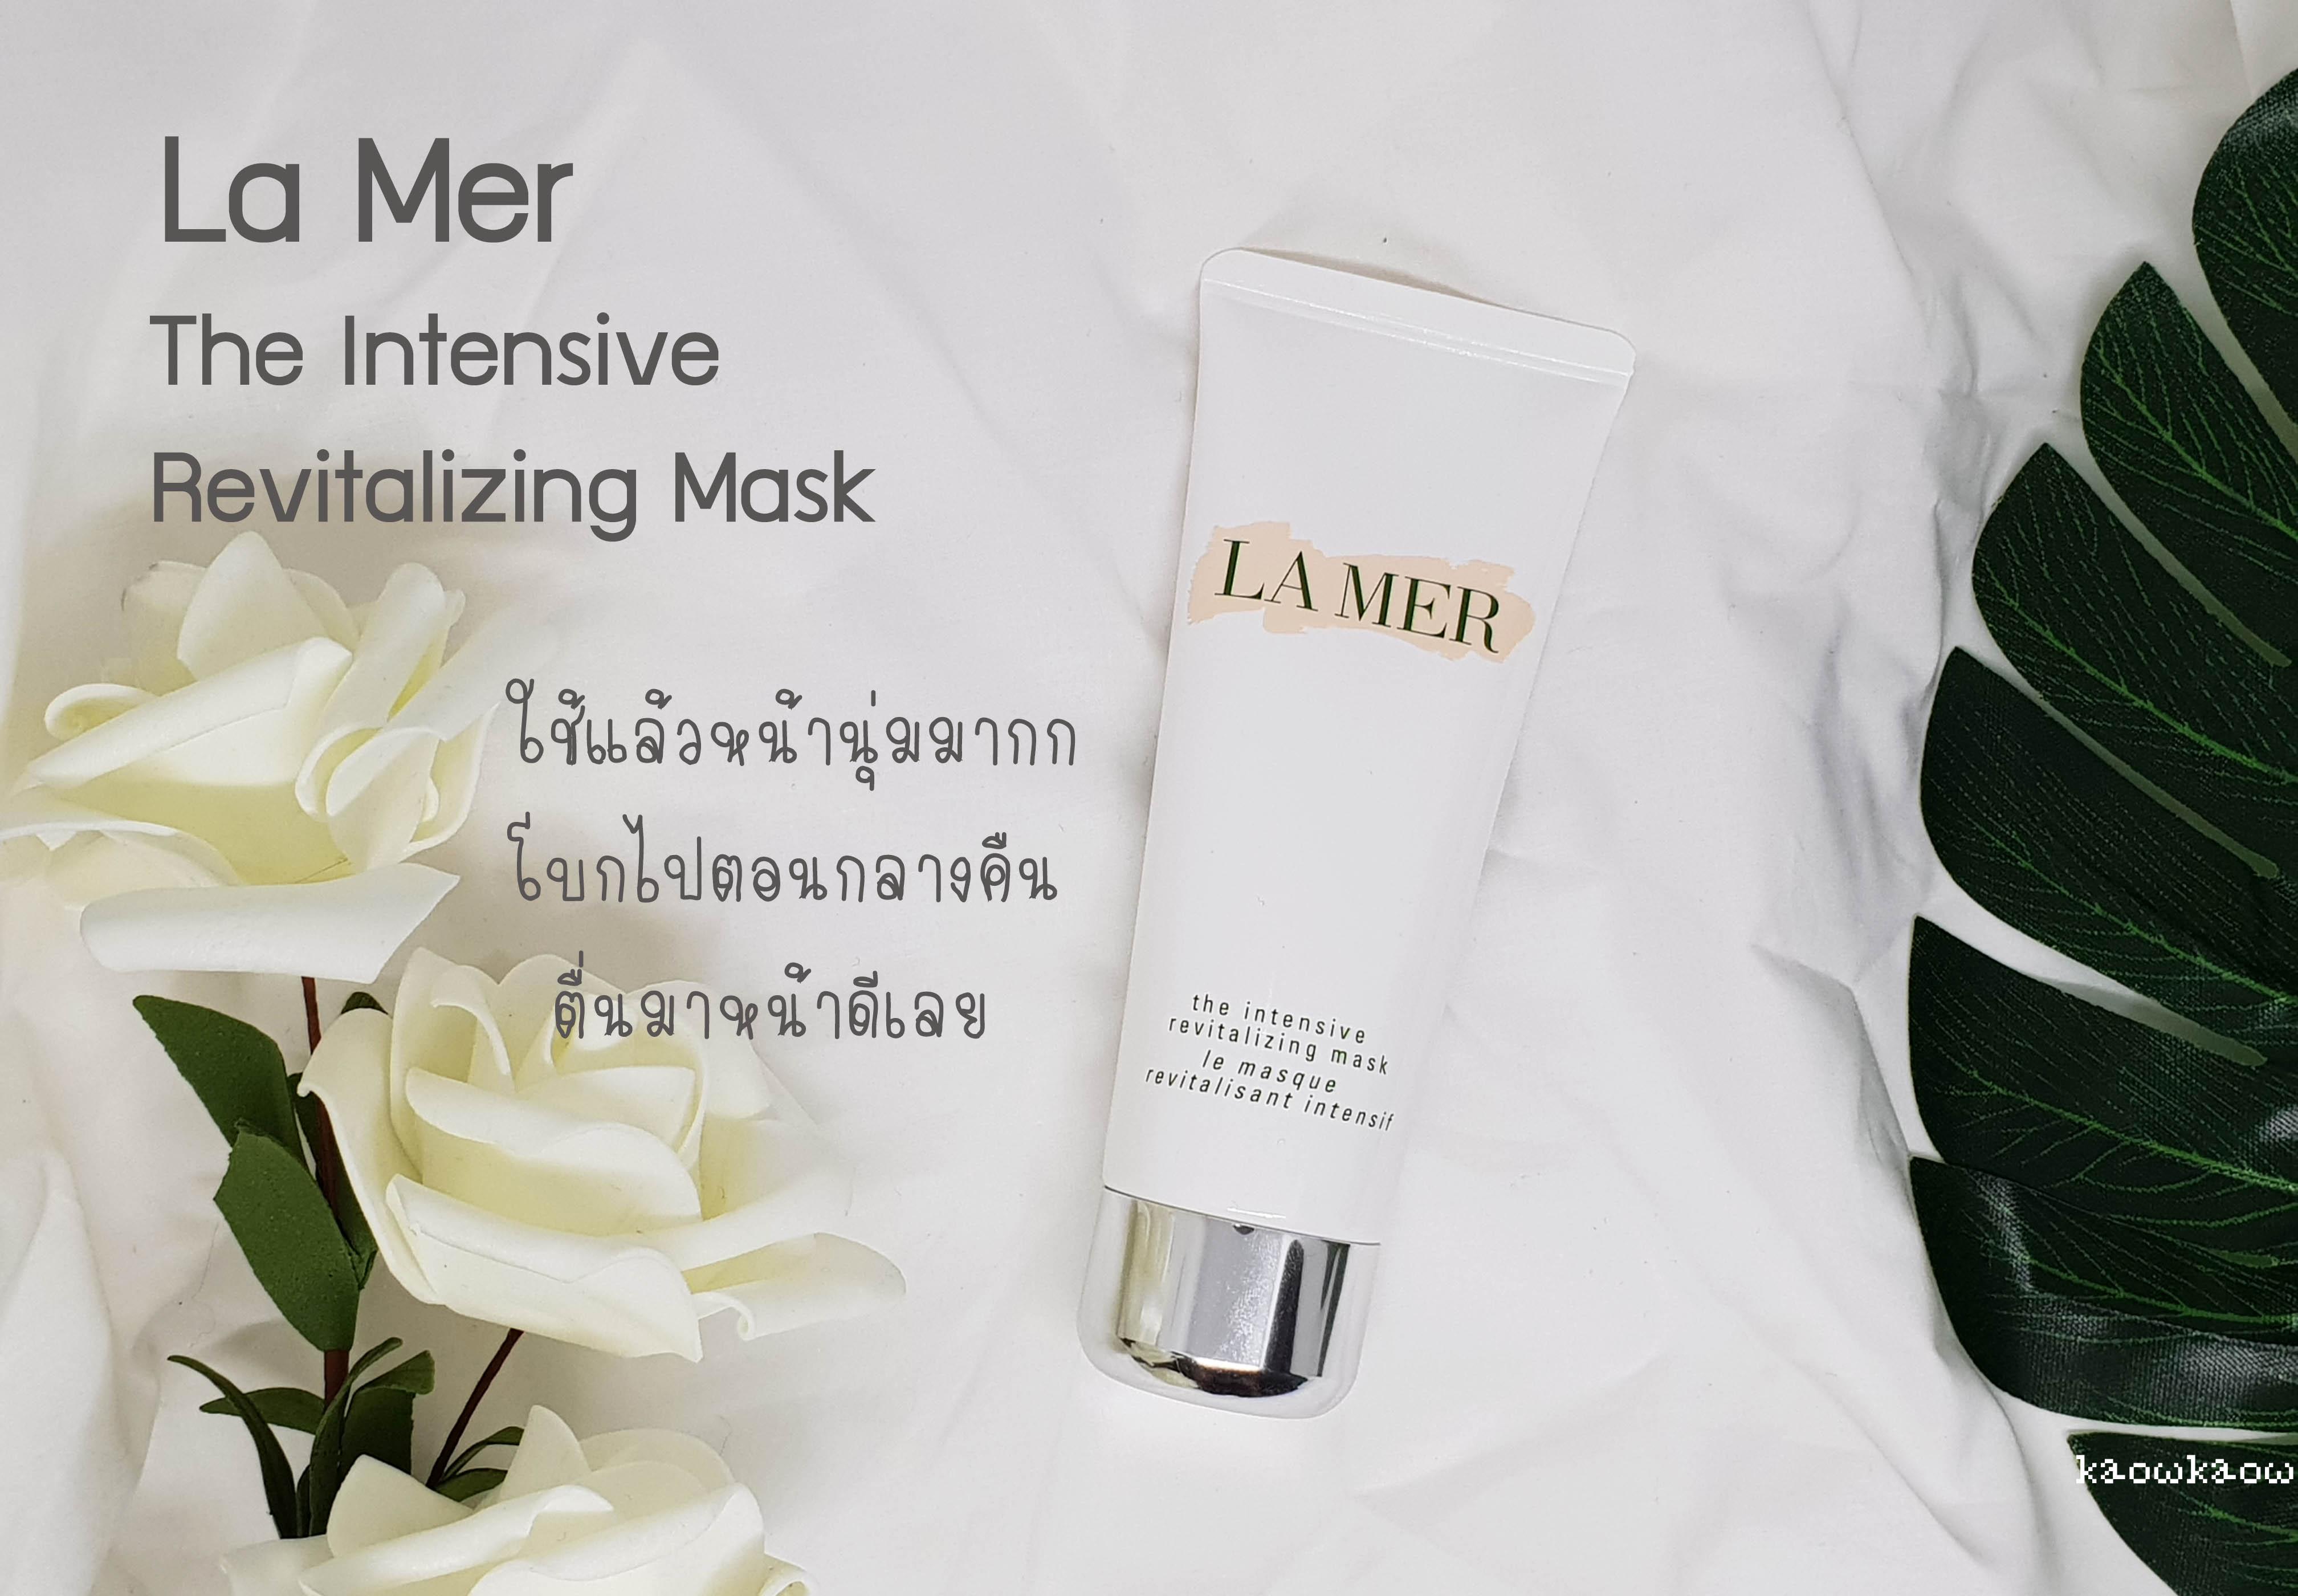 Favorite Item 2018 ใช แล วชอบท ส ดประจำป 2018 ท ง Skincare Makeup Pantip